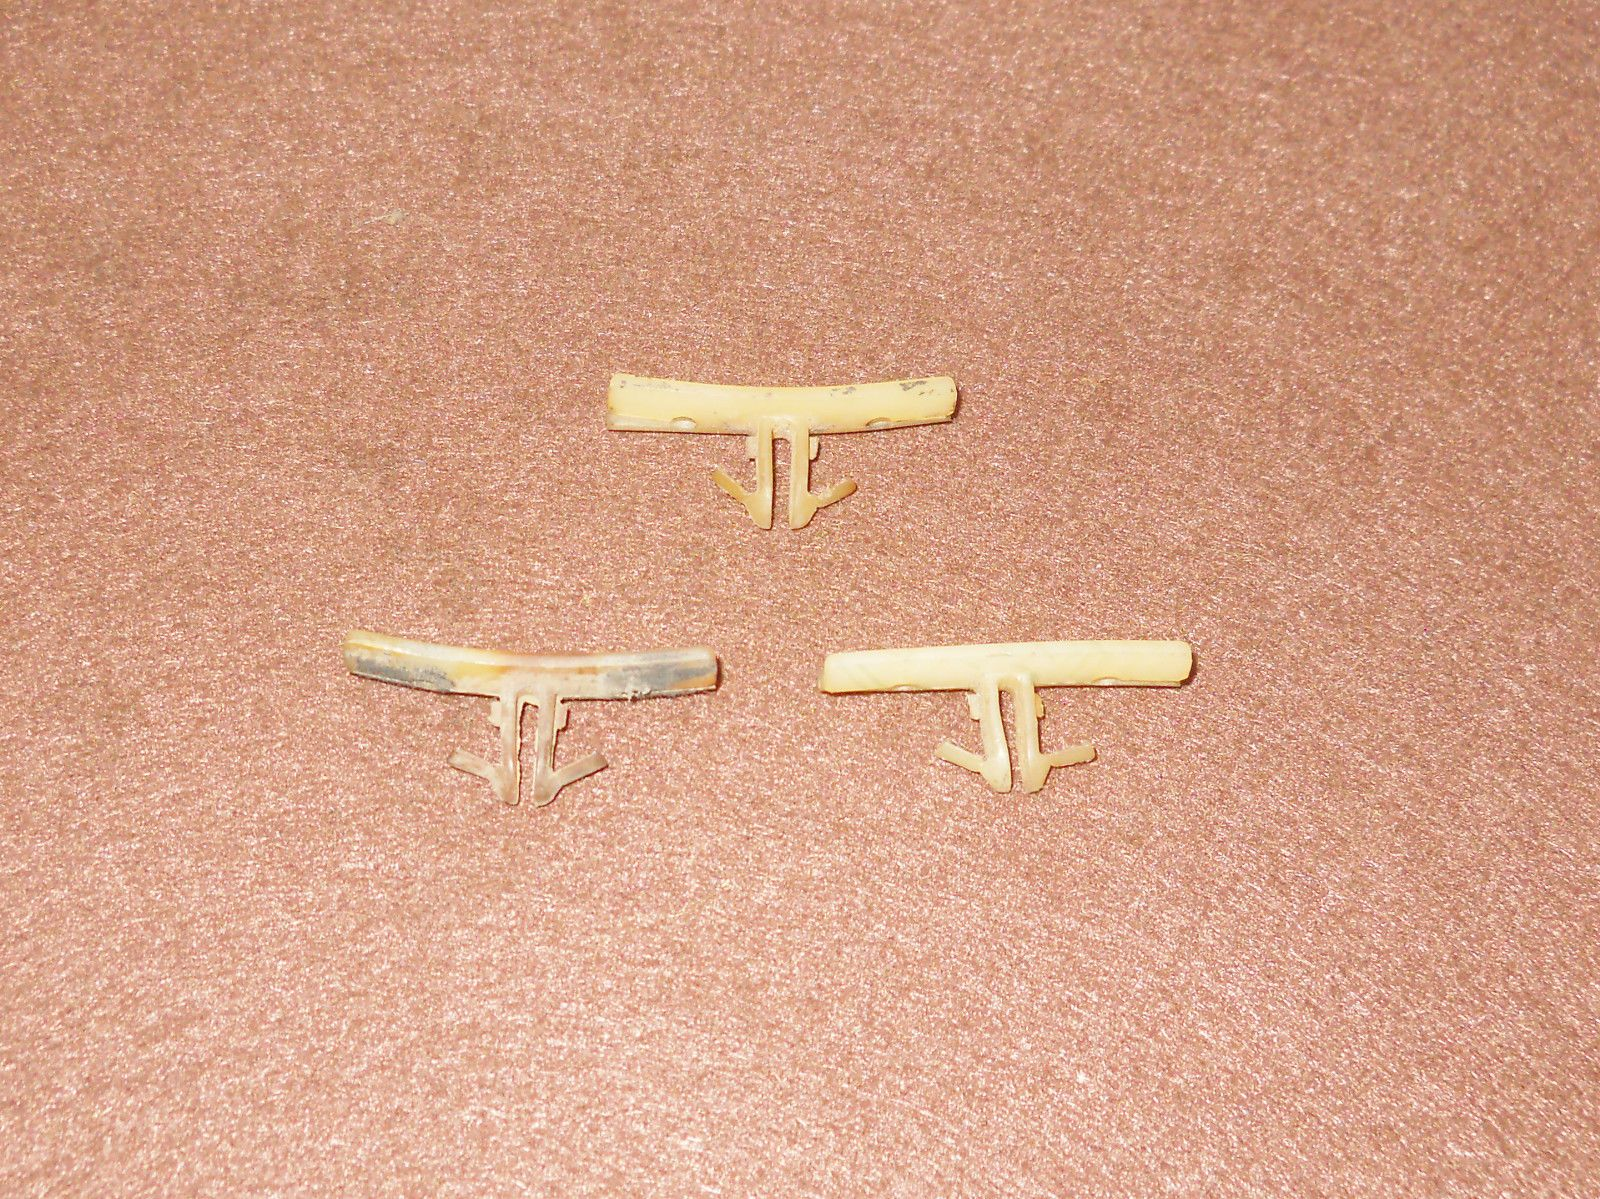 ford mustang shelby fairlane falcon torino ranchero cougar wiring harness clips [ 1600 x 1199 Pixel ]